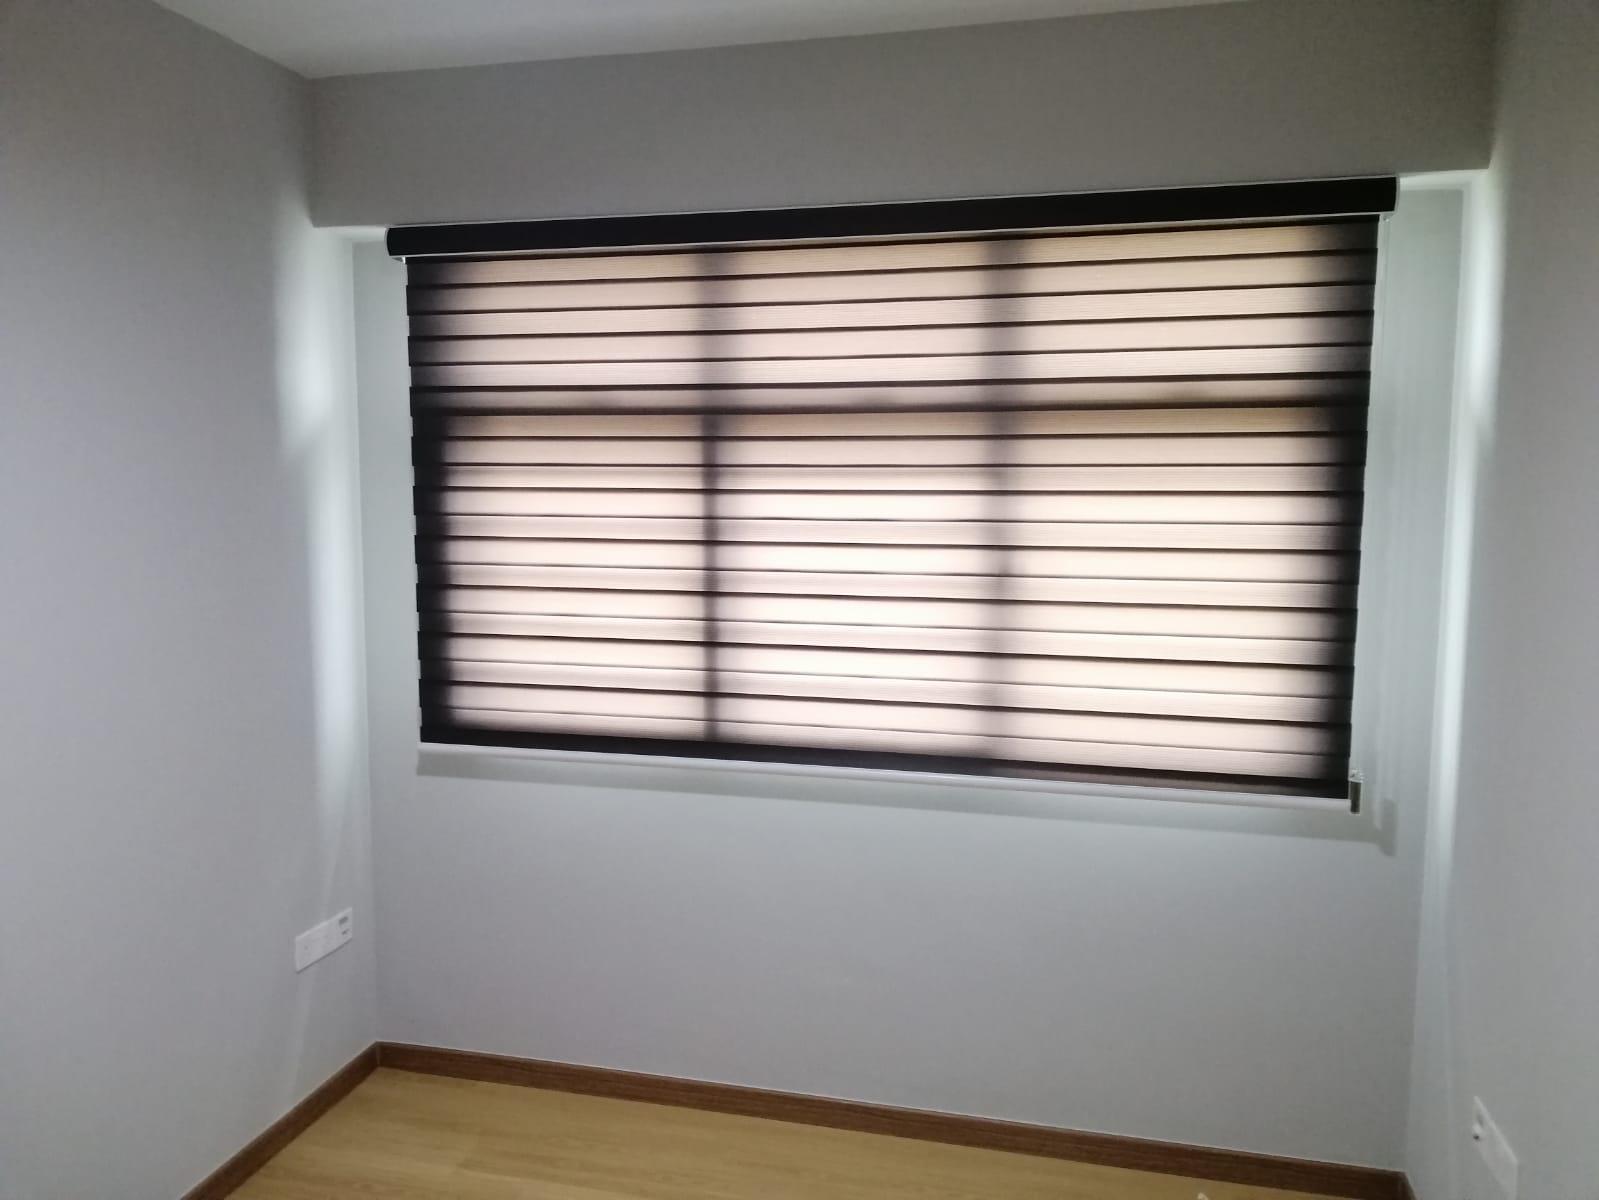 Korean Blinds Bedroom Blinds Installation Curtains House Singapore HDB – Serangoon